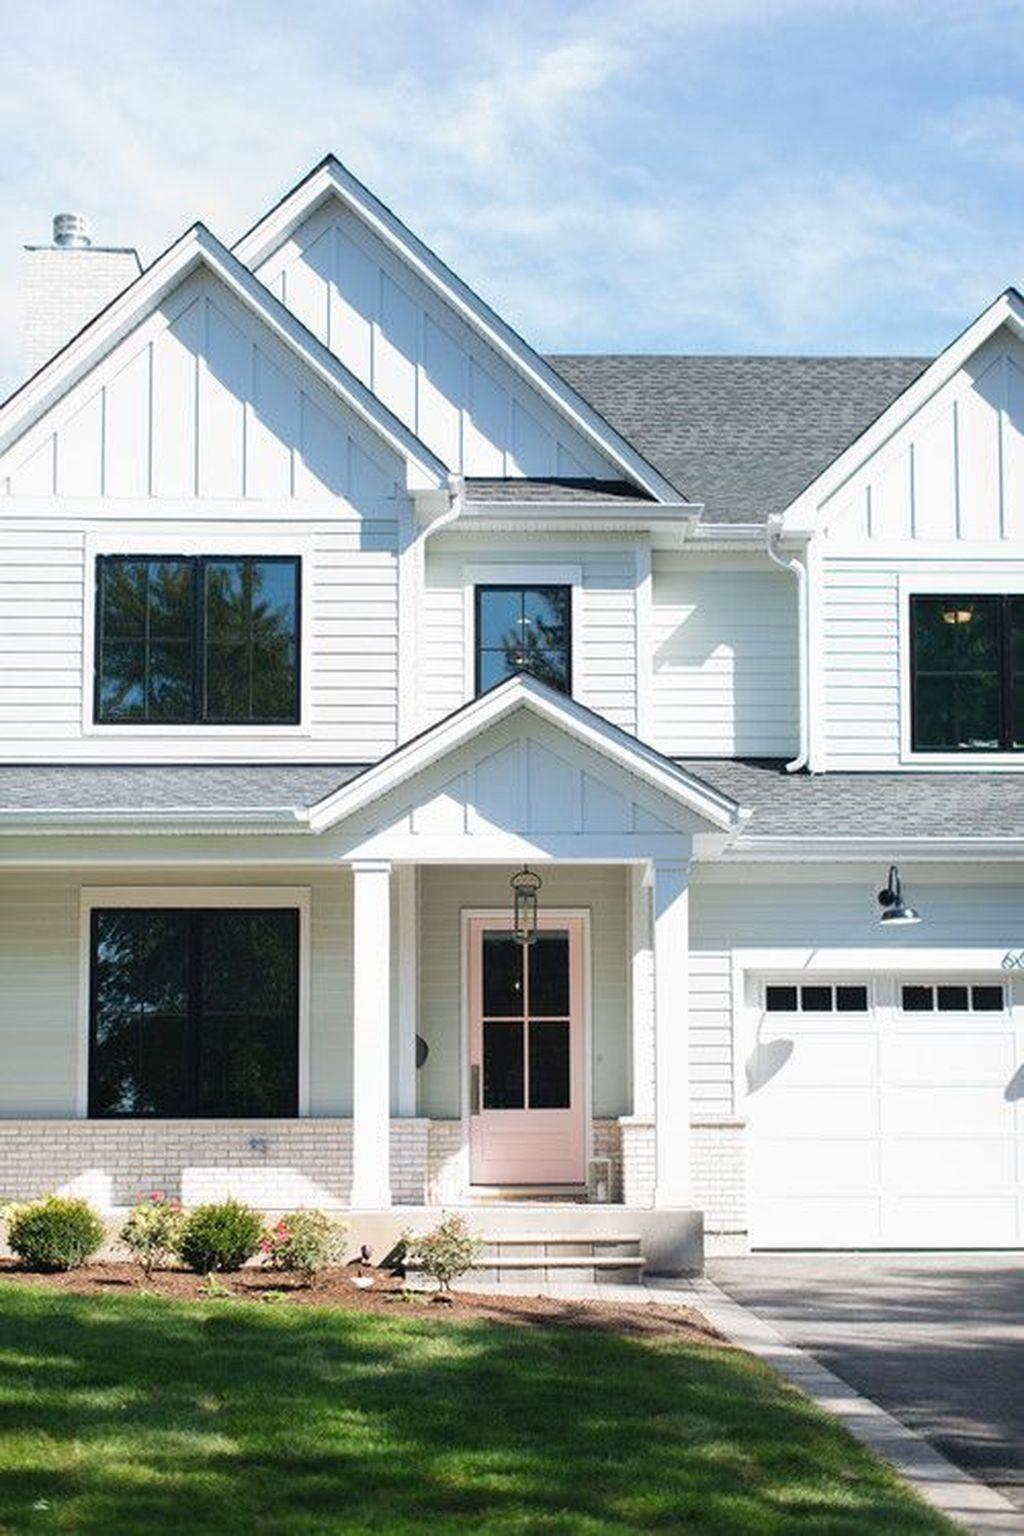 Captivating Farmhouse Exterior House Design Ideas To Copy Right Now 14